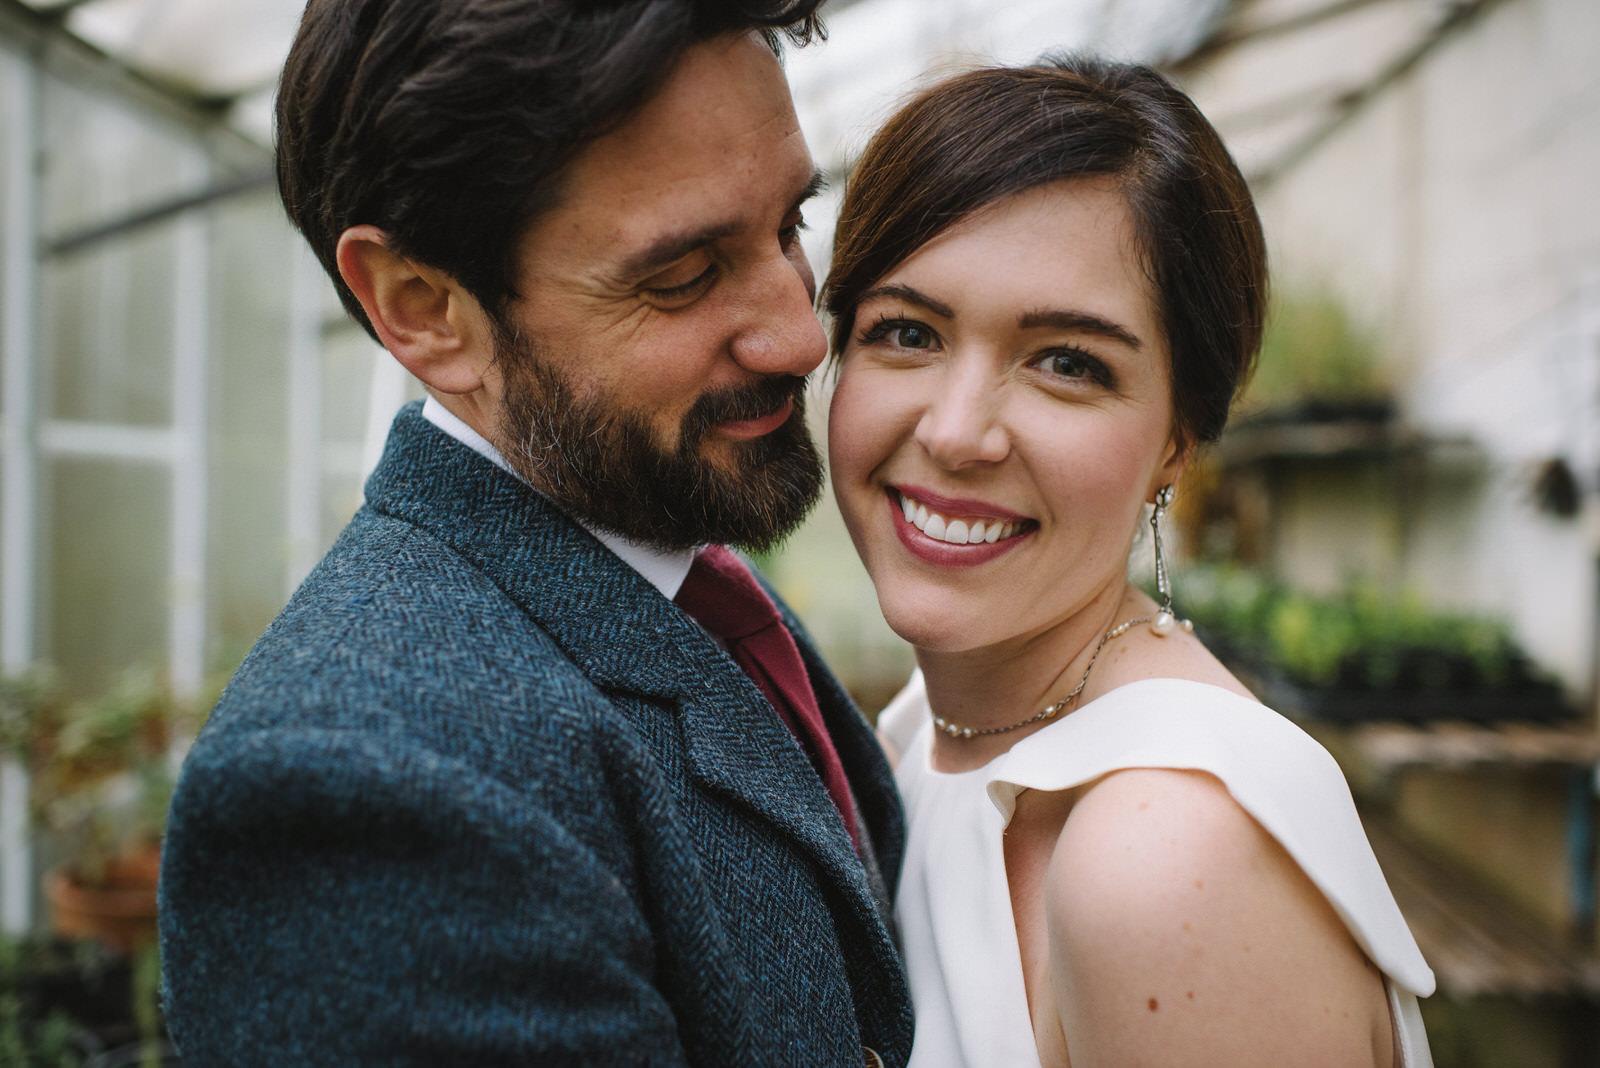 026-COLSTOUN-HOUSE-WEDDING-ALTERNATIVE-WEDDING-PHOTOGRAPHER-GLASGOW-WEDDING-PHOTOGRAPHER-STYLISH-SCOTTISH-WEDDING.JPG